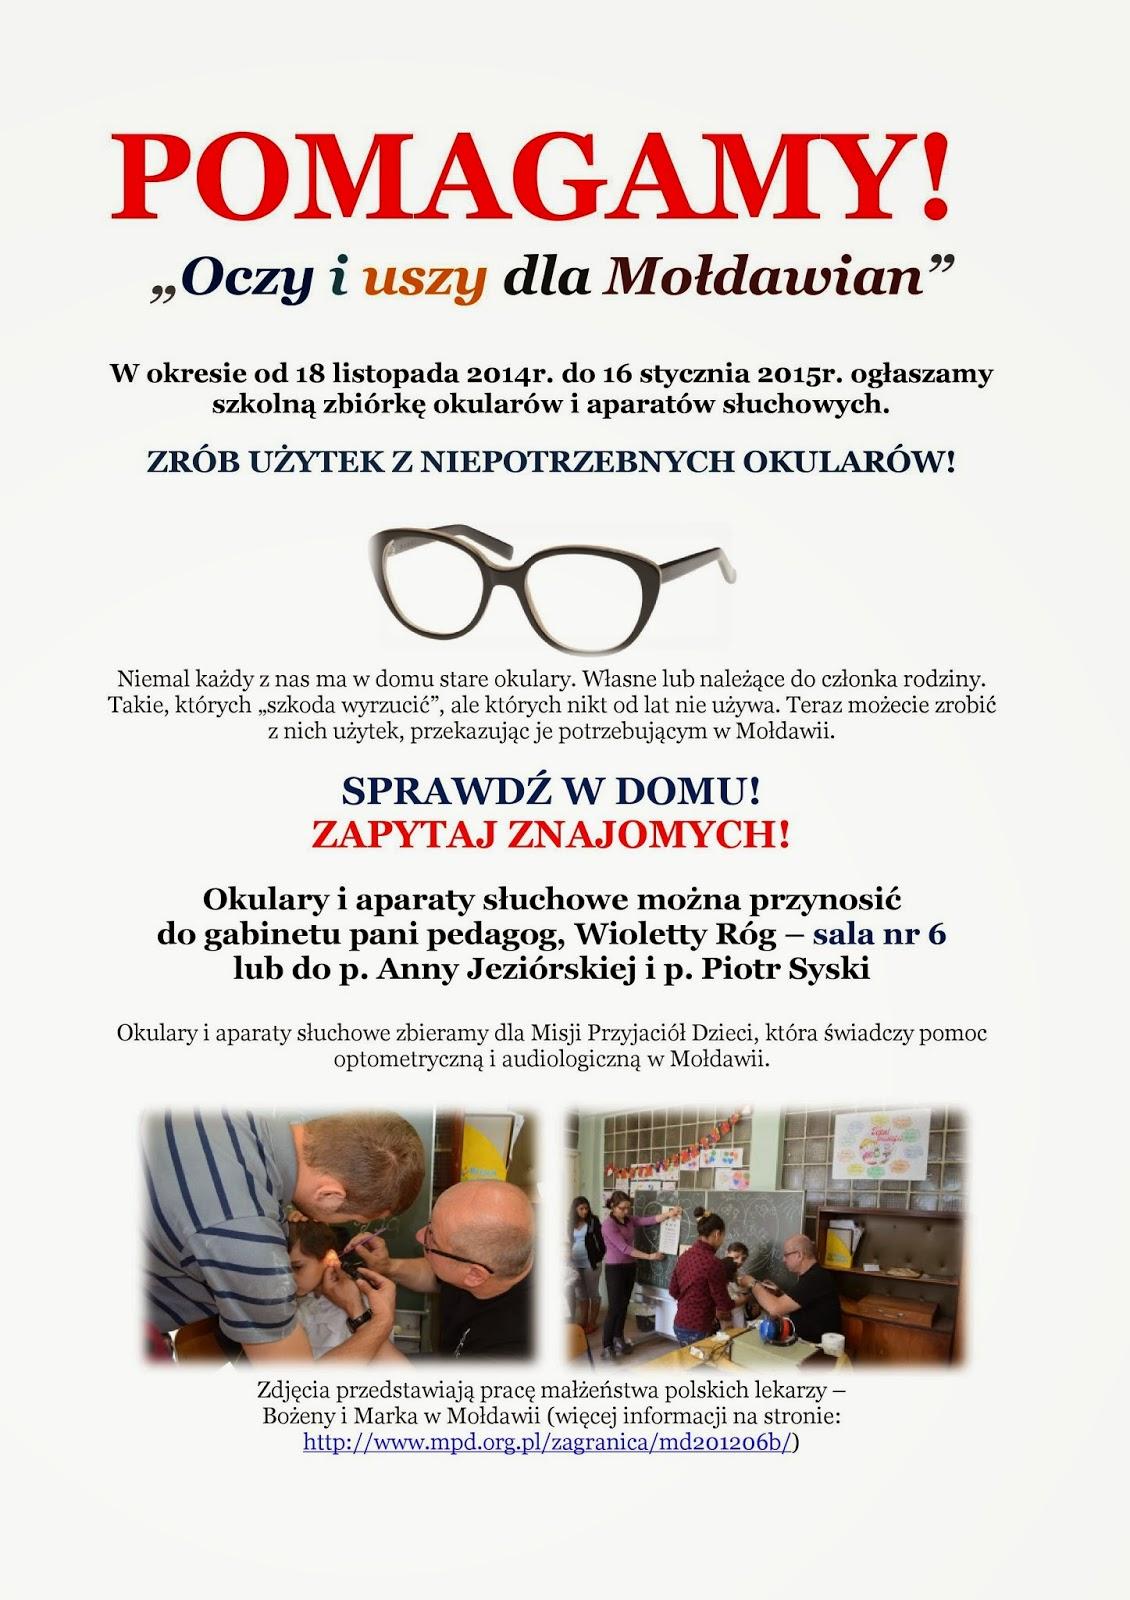 http://chcemypomagac.blogspot.com/2014/11/oczy-i-uszy-dla-modawii.html